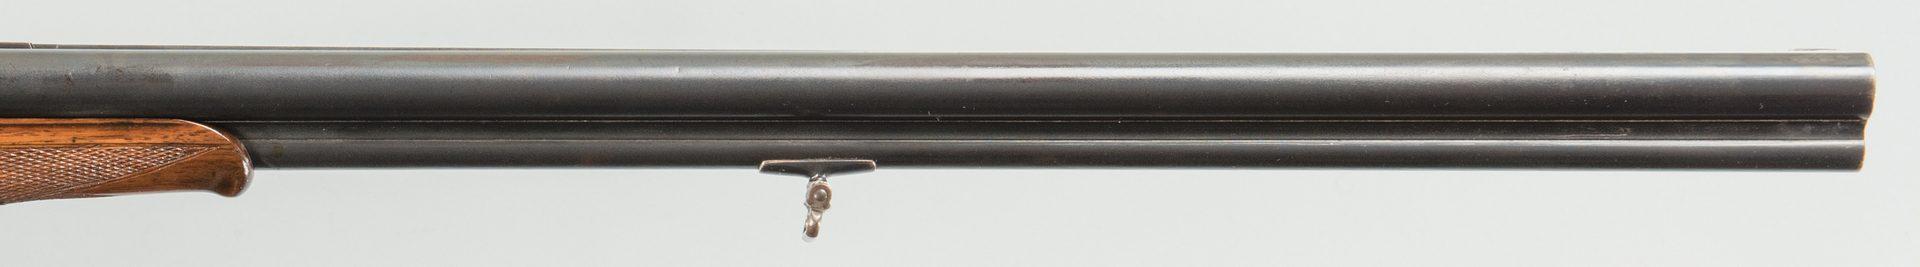 Lot 815: Krieghoff pre-War Drilling 16 over 9.72R.